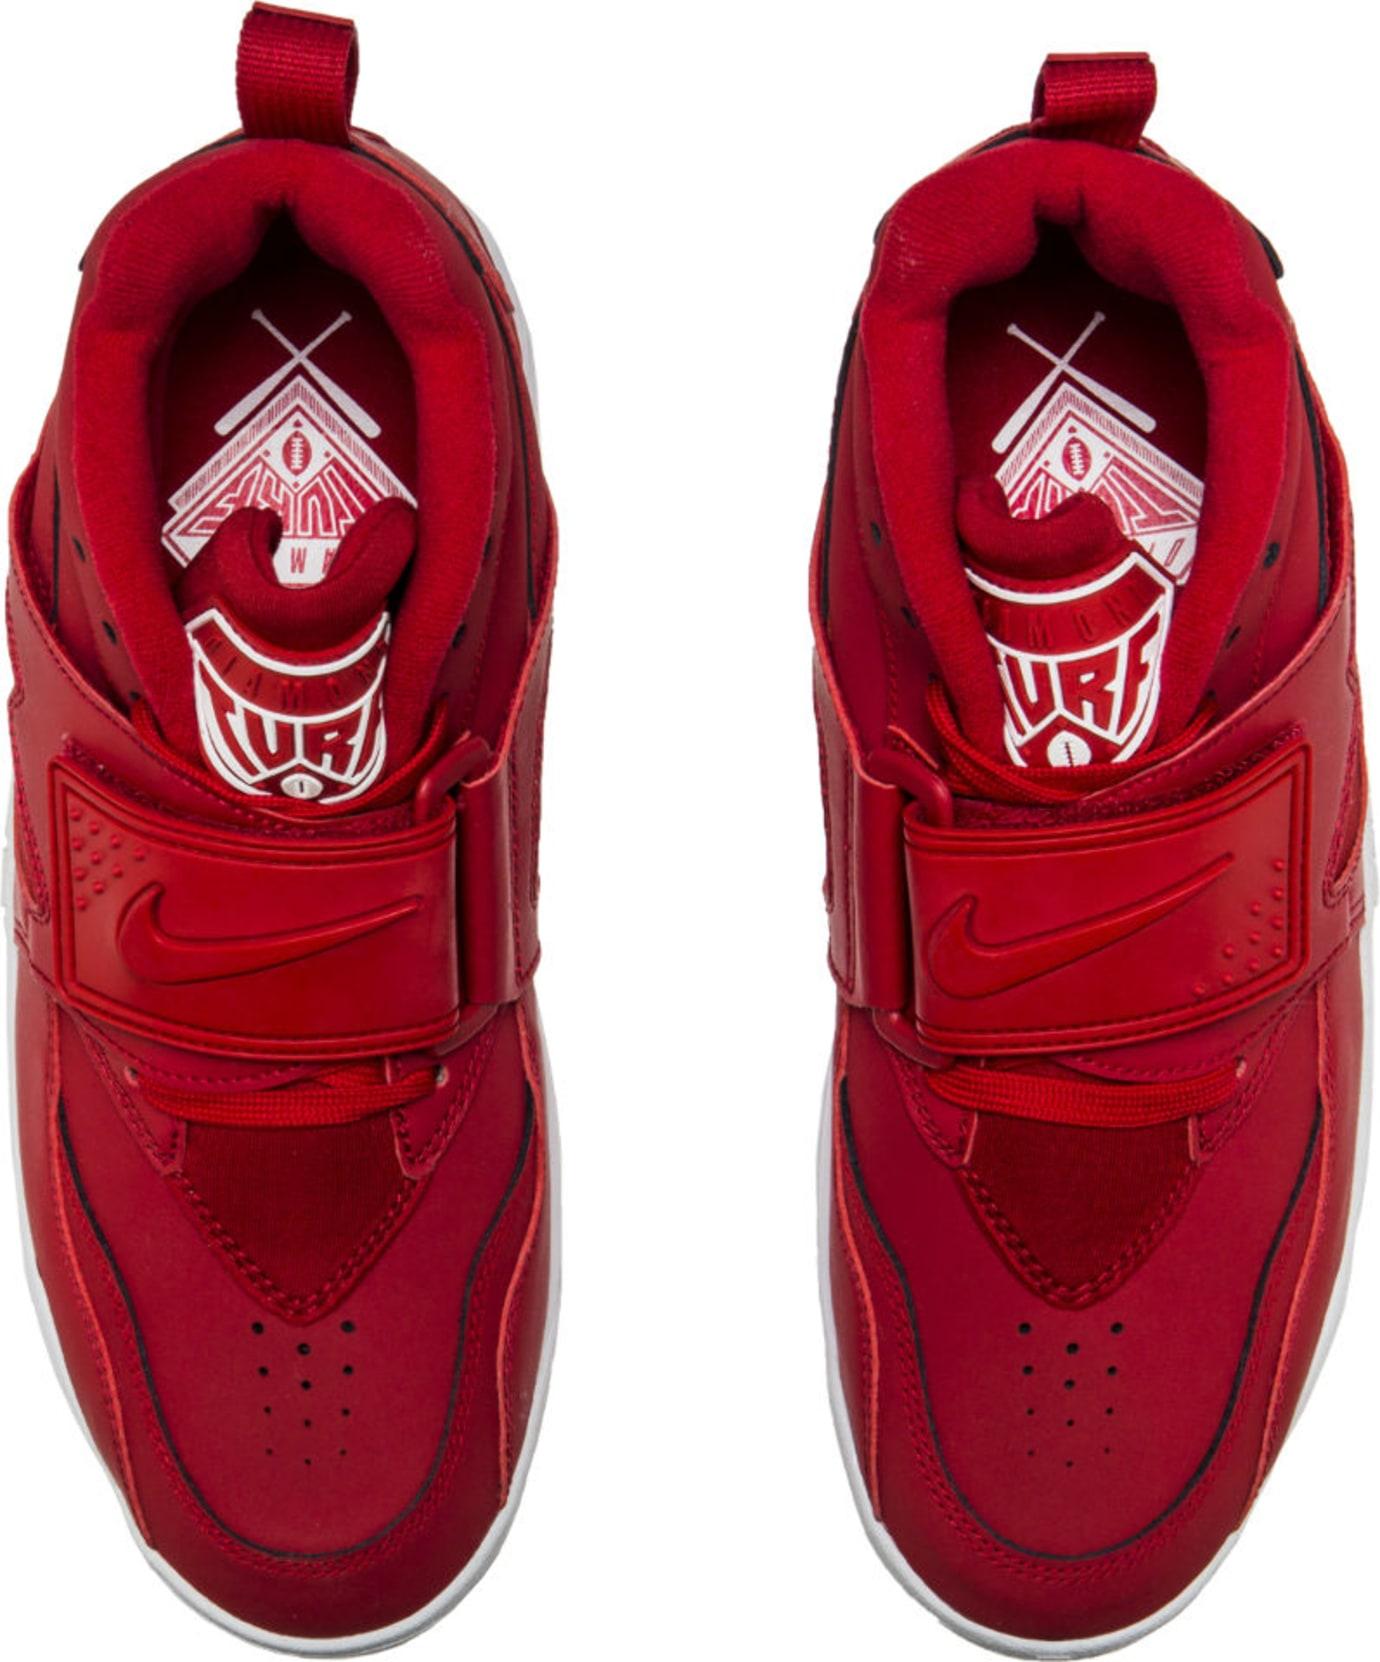 Nike Air Diamond Turf Red White 309434-600 Top